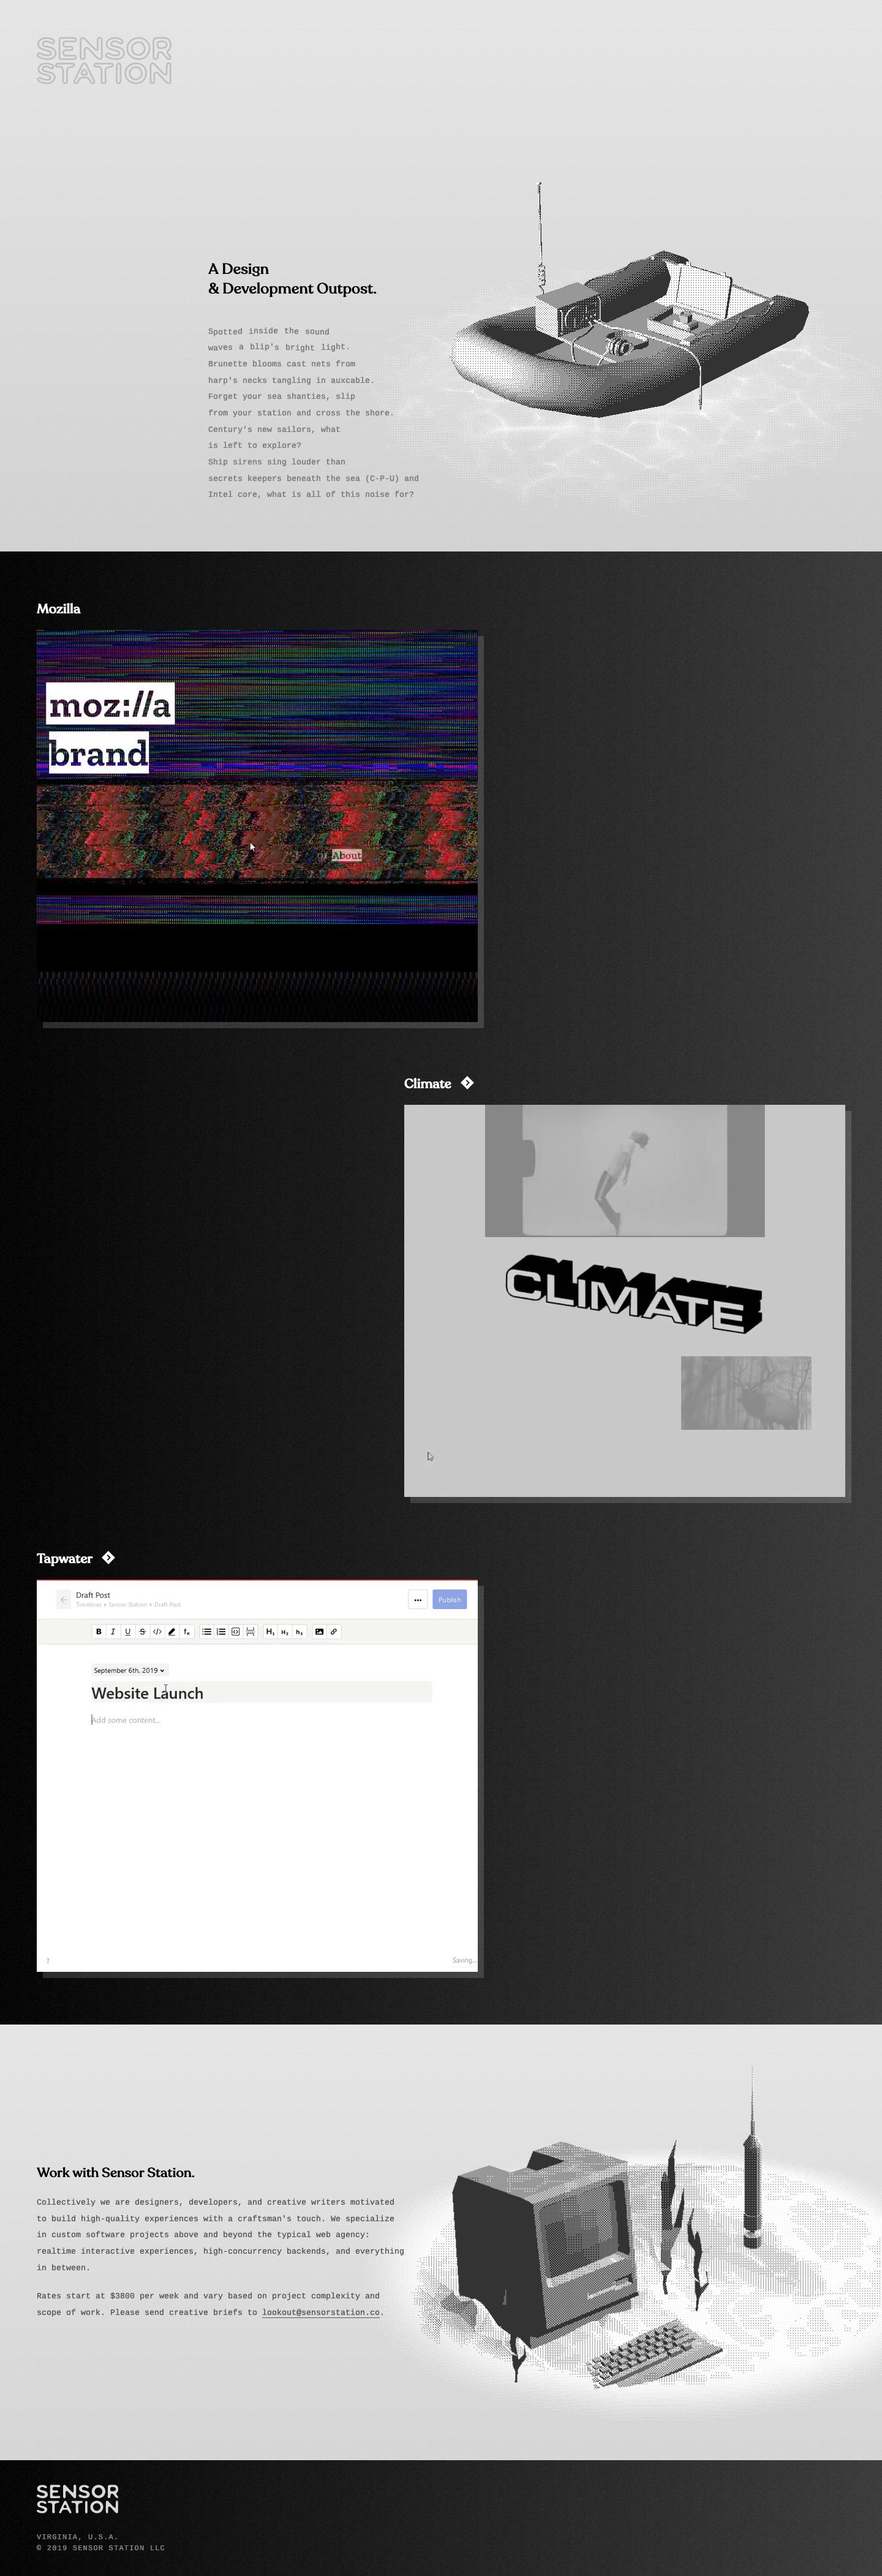 Sensor Station landing page design inspiration - Lapa Ninja